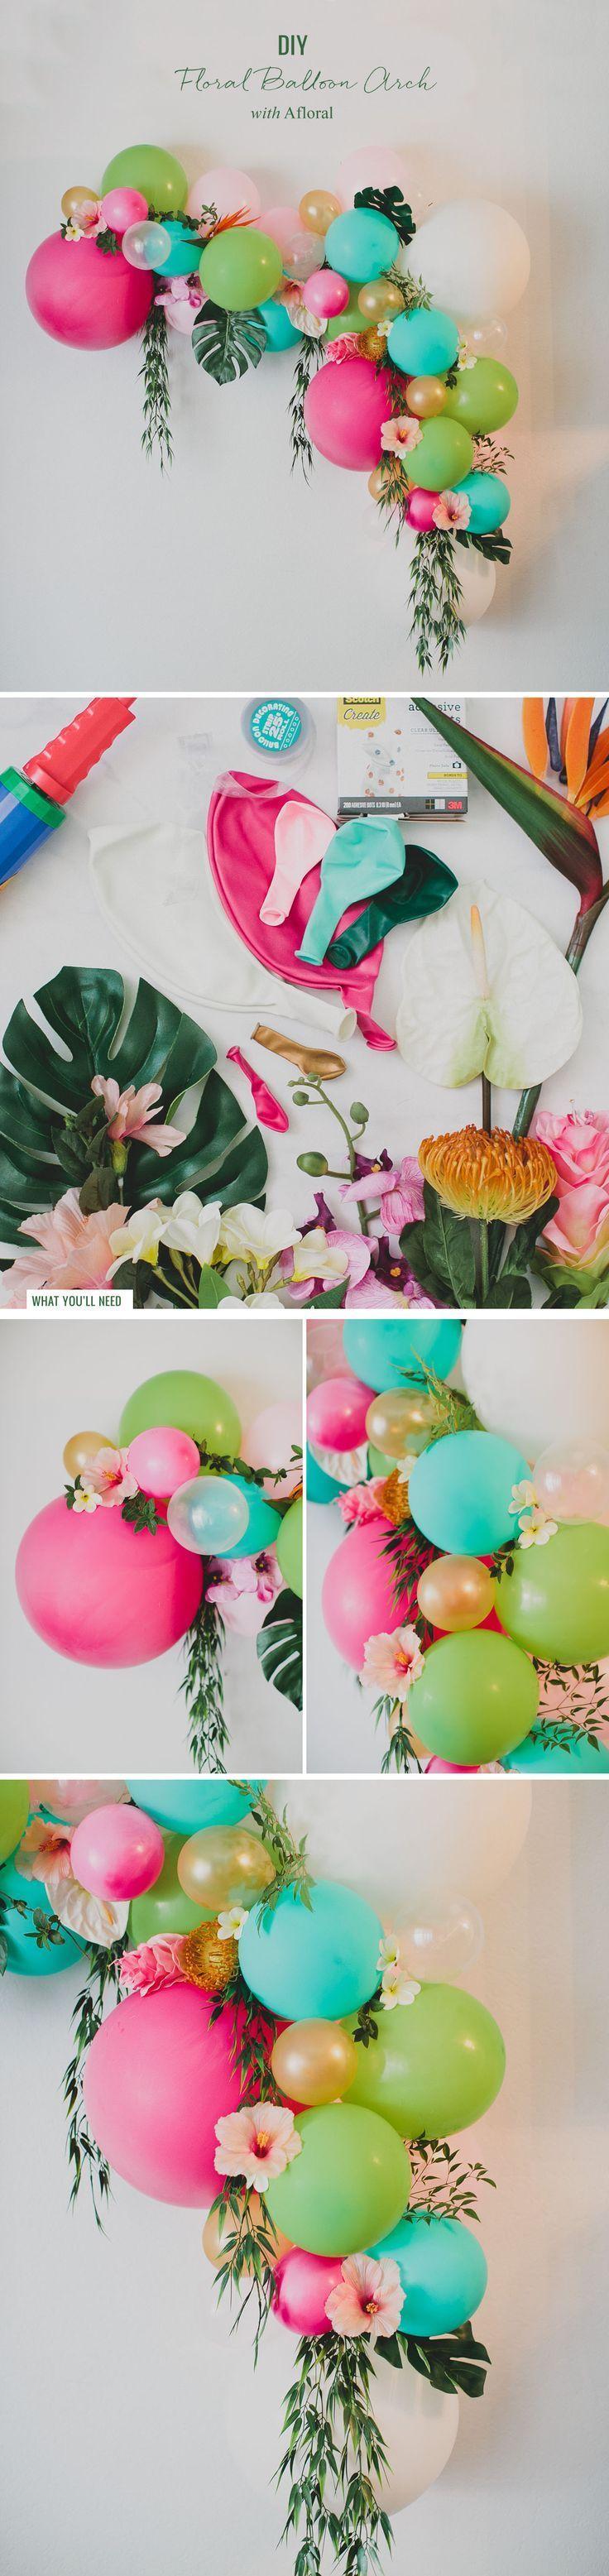 Wedding decoration ideas balloons  Moana Wedding Theme Decor Fantastical Weddings Decor